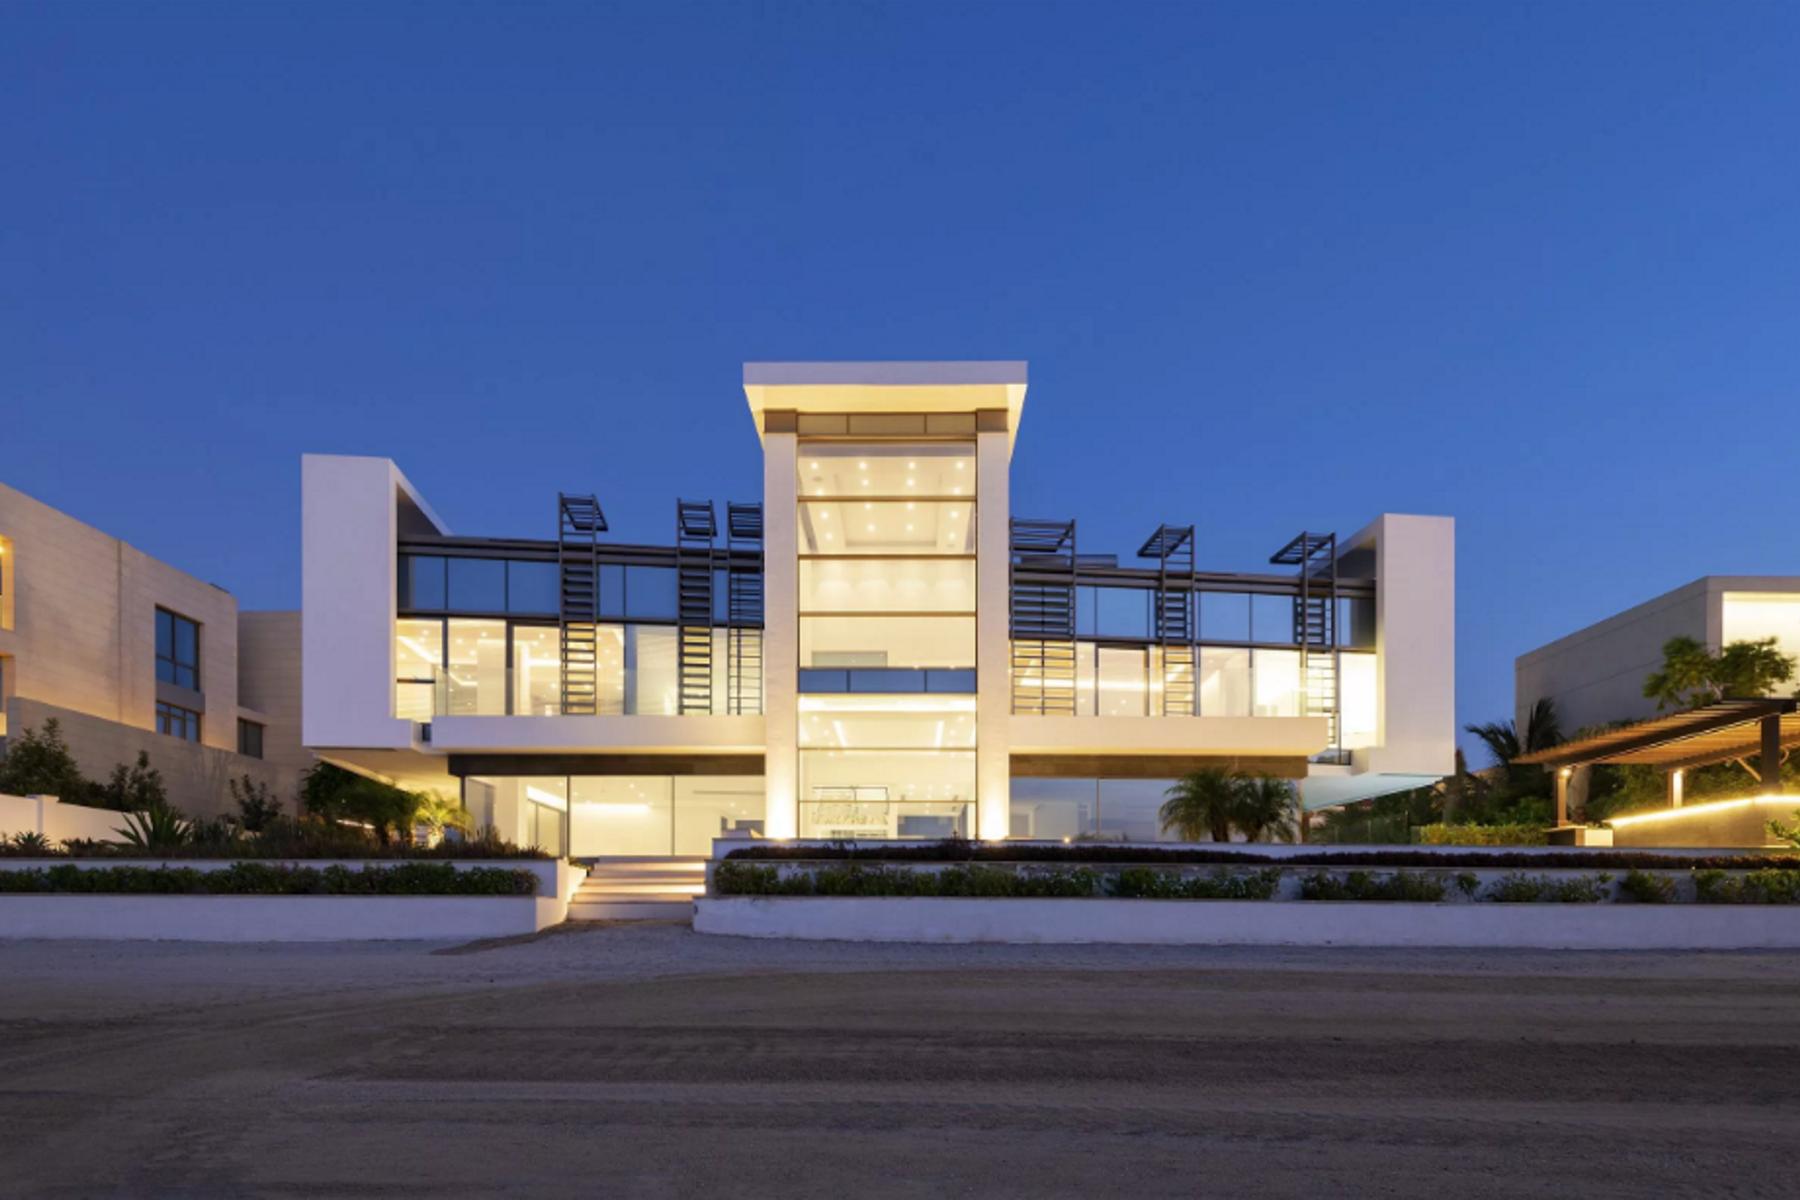 Property for Sale at Luxury Beachfront Mansion Palm Jumeirah Dubai, Dubai United Arab Emirates